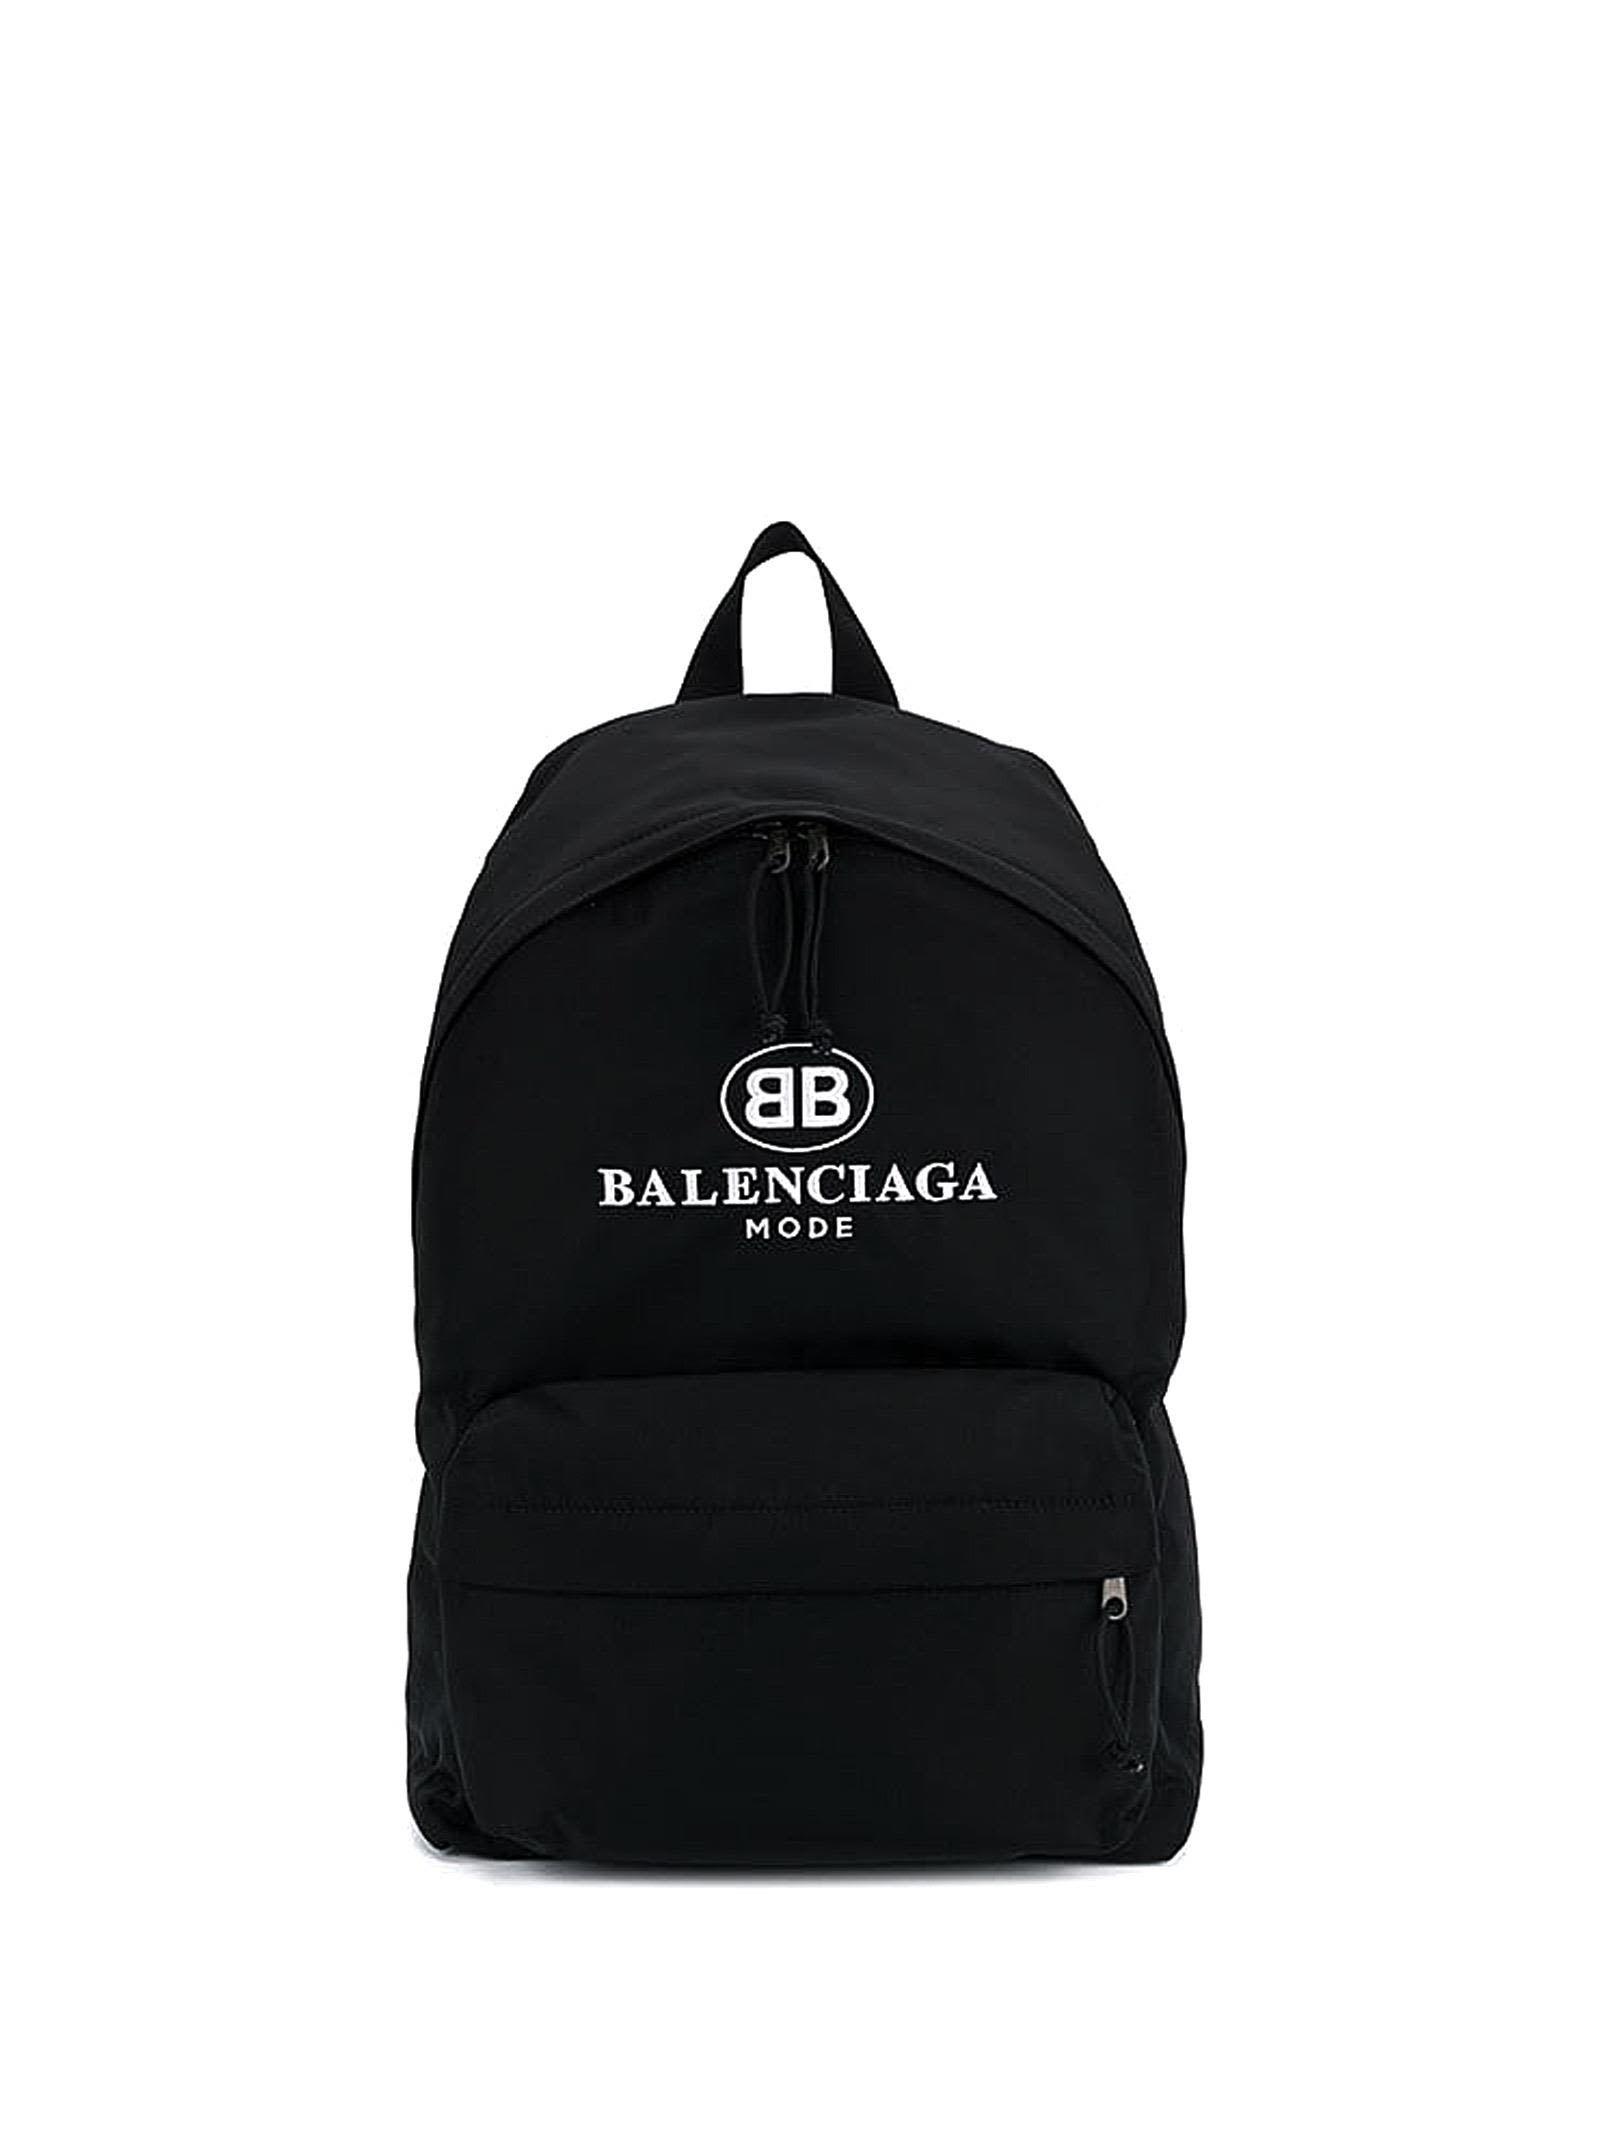 9fcb0db420 BALENCIAGA BLACK EXPLORER MODE BACKPACK.  balenciaga  bags  nylon  backpacks